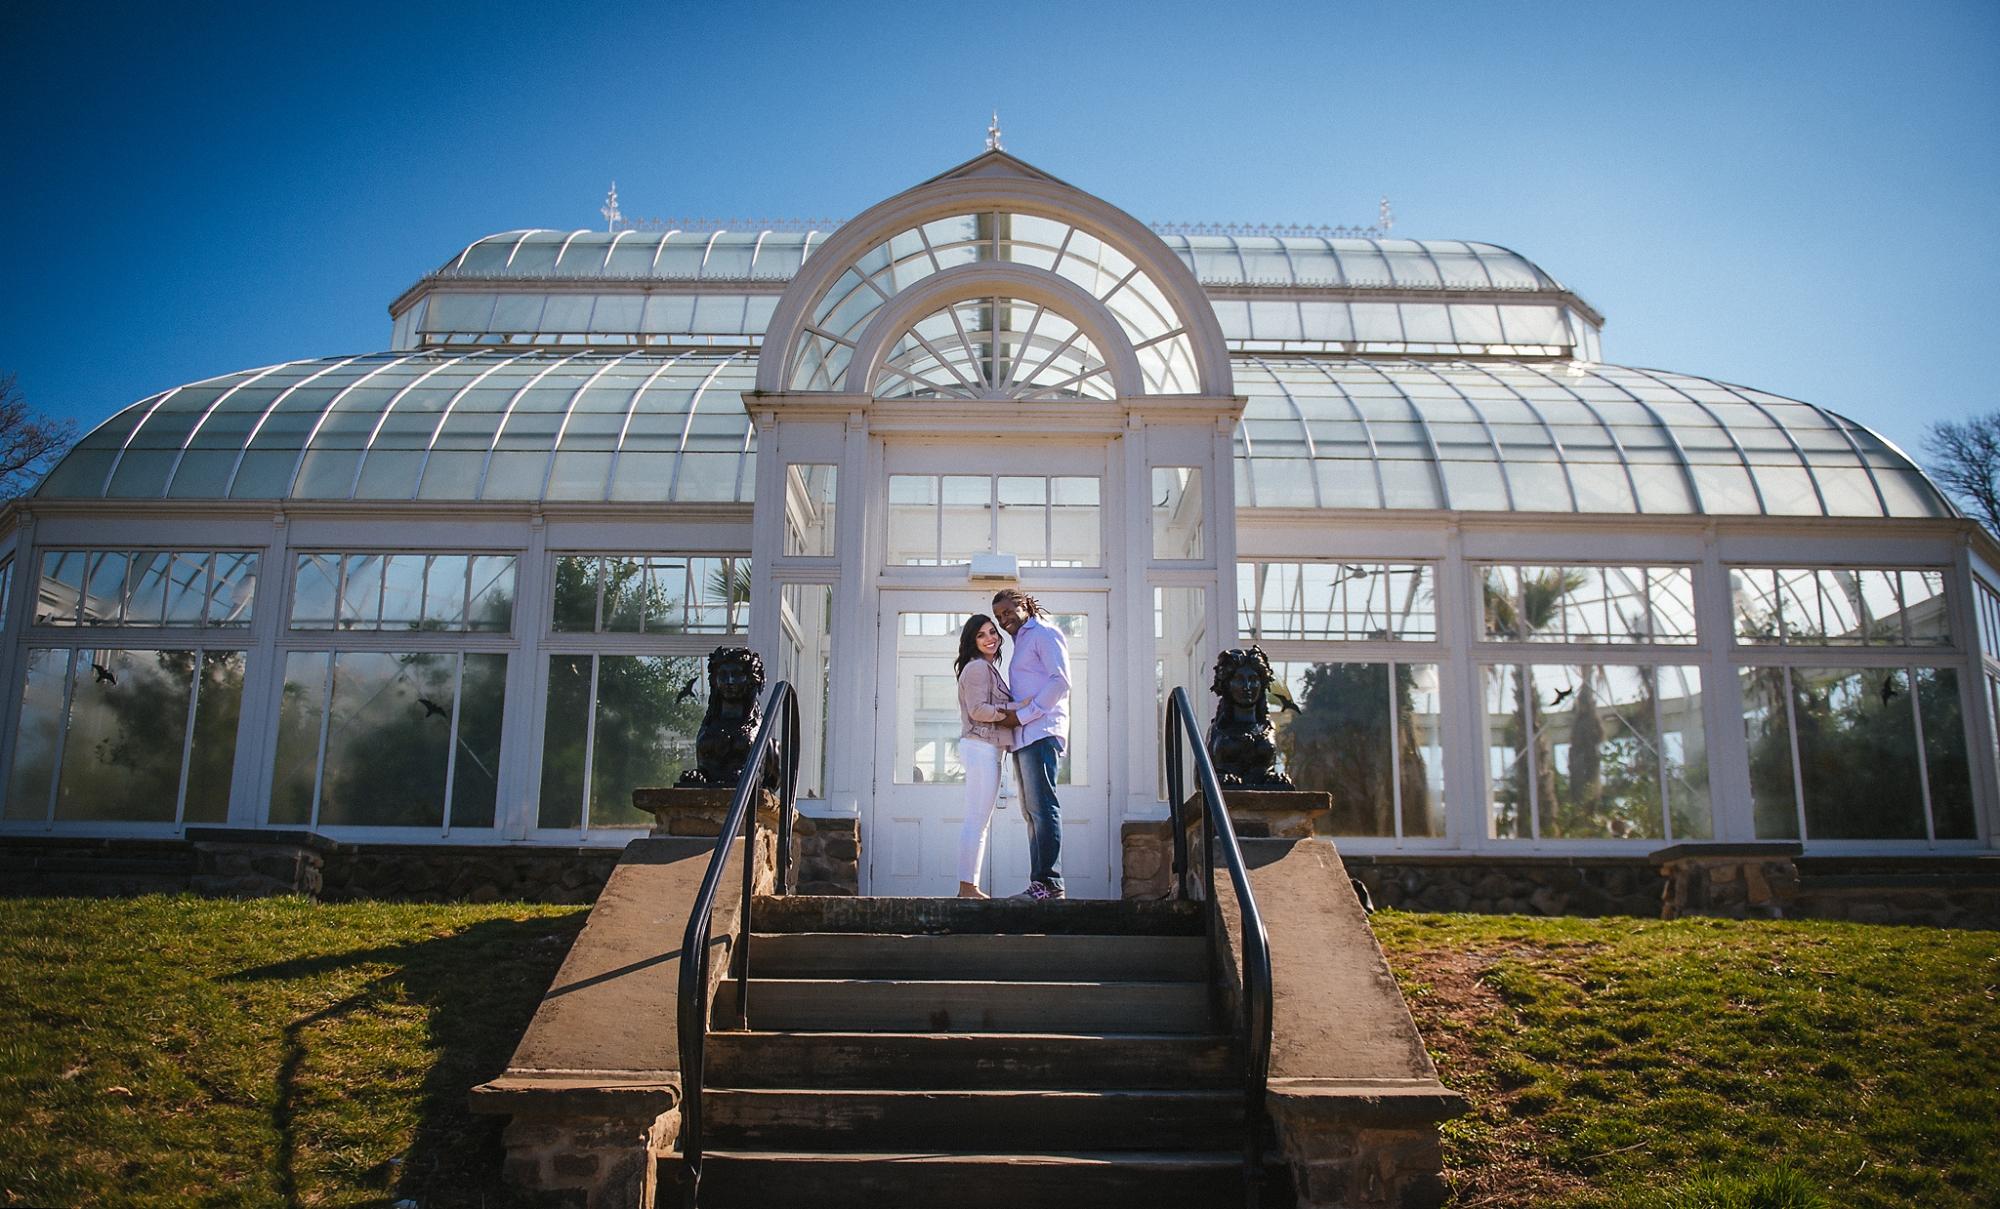 Basking-ridge-country-club-wedding-photographer-9